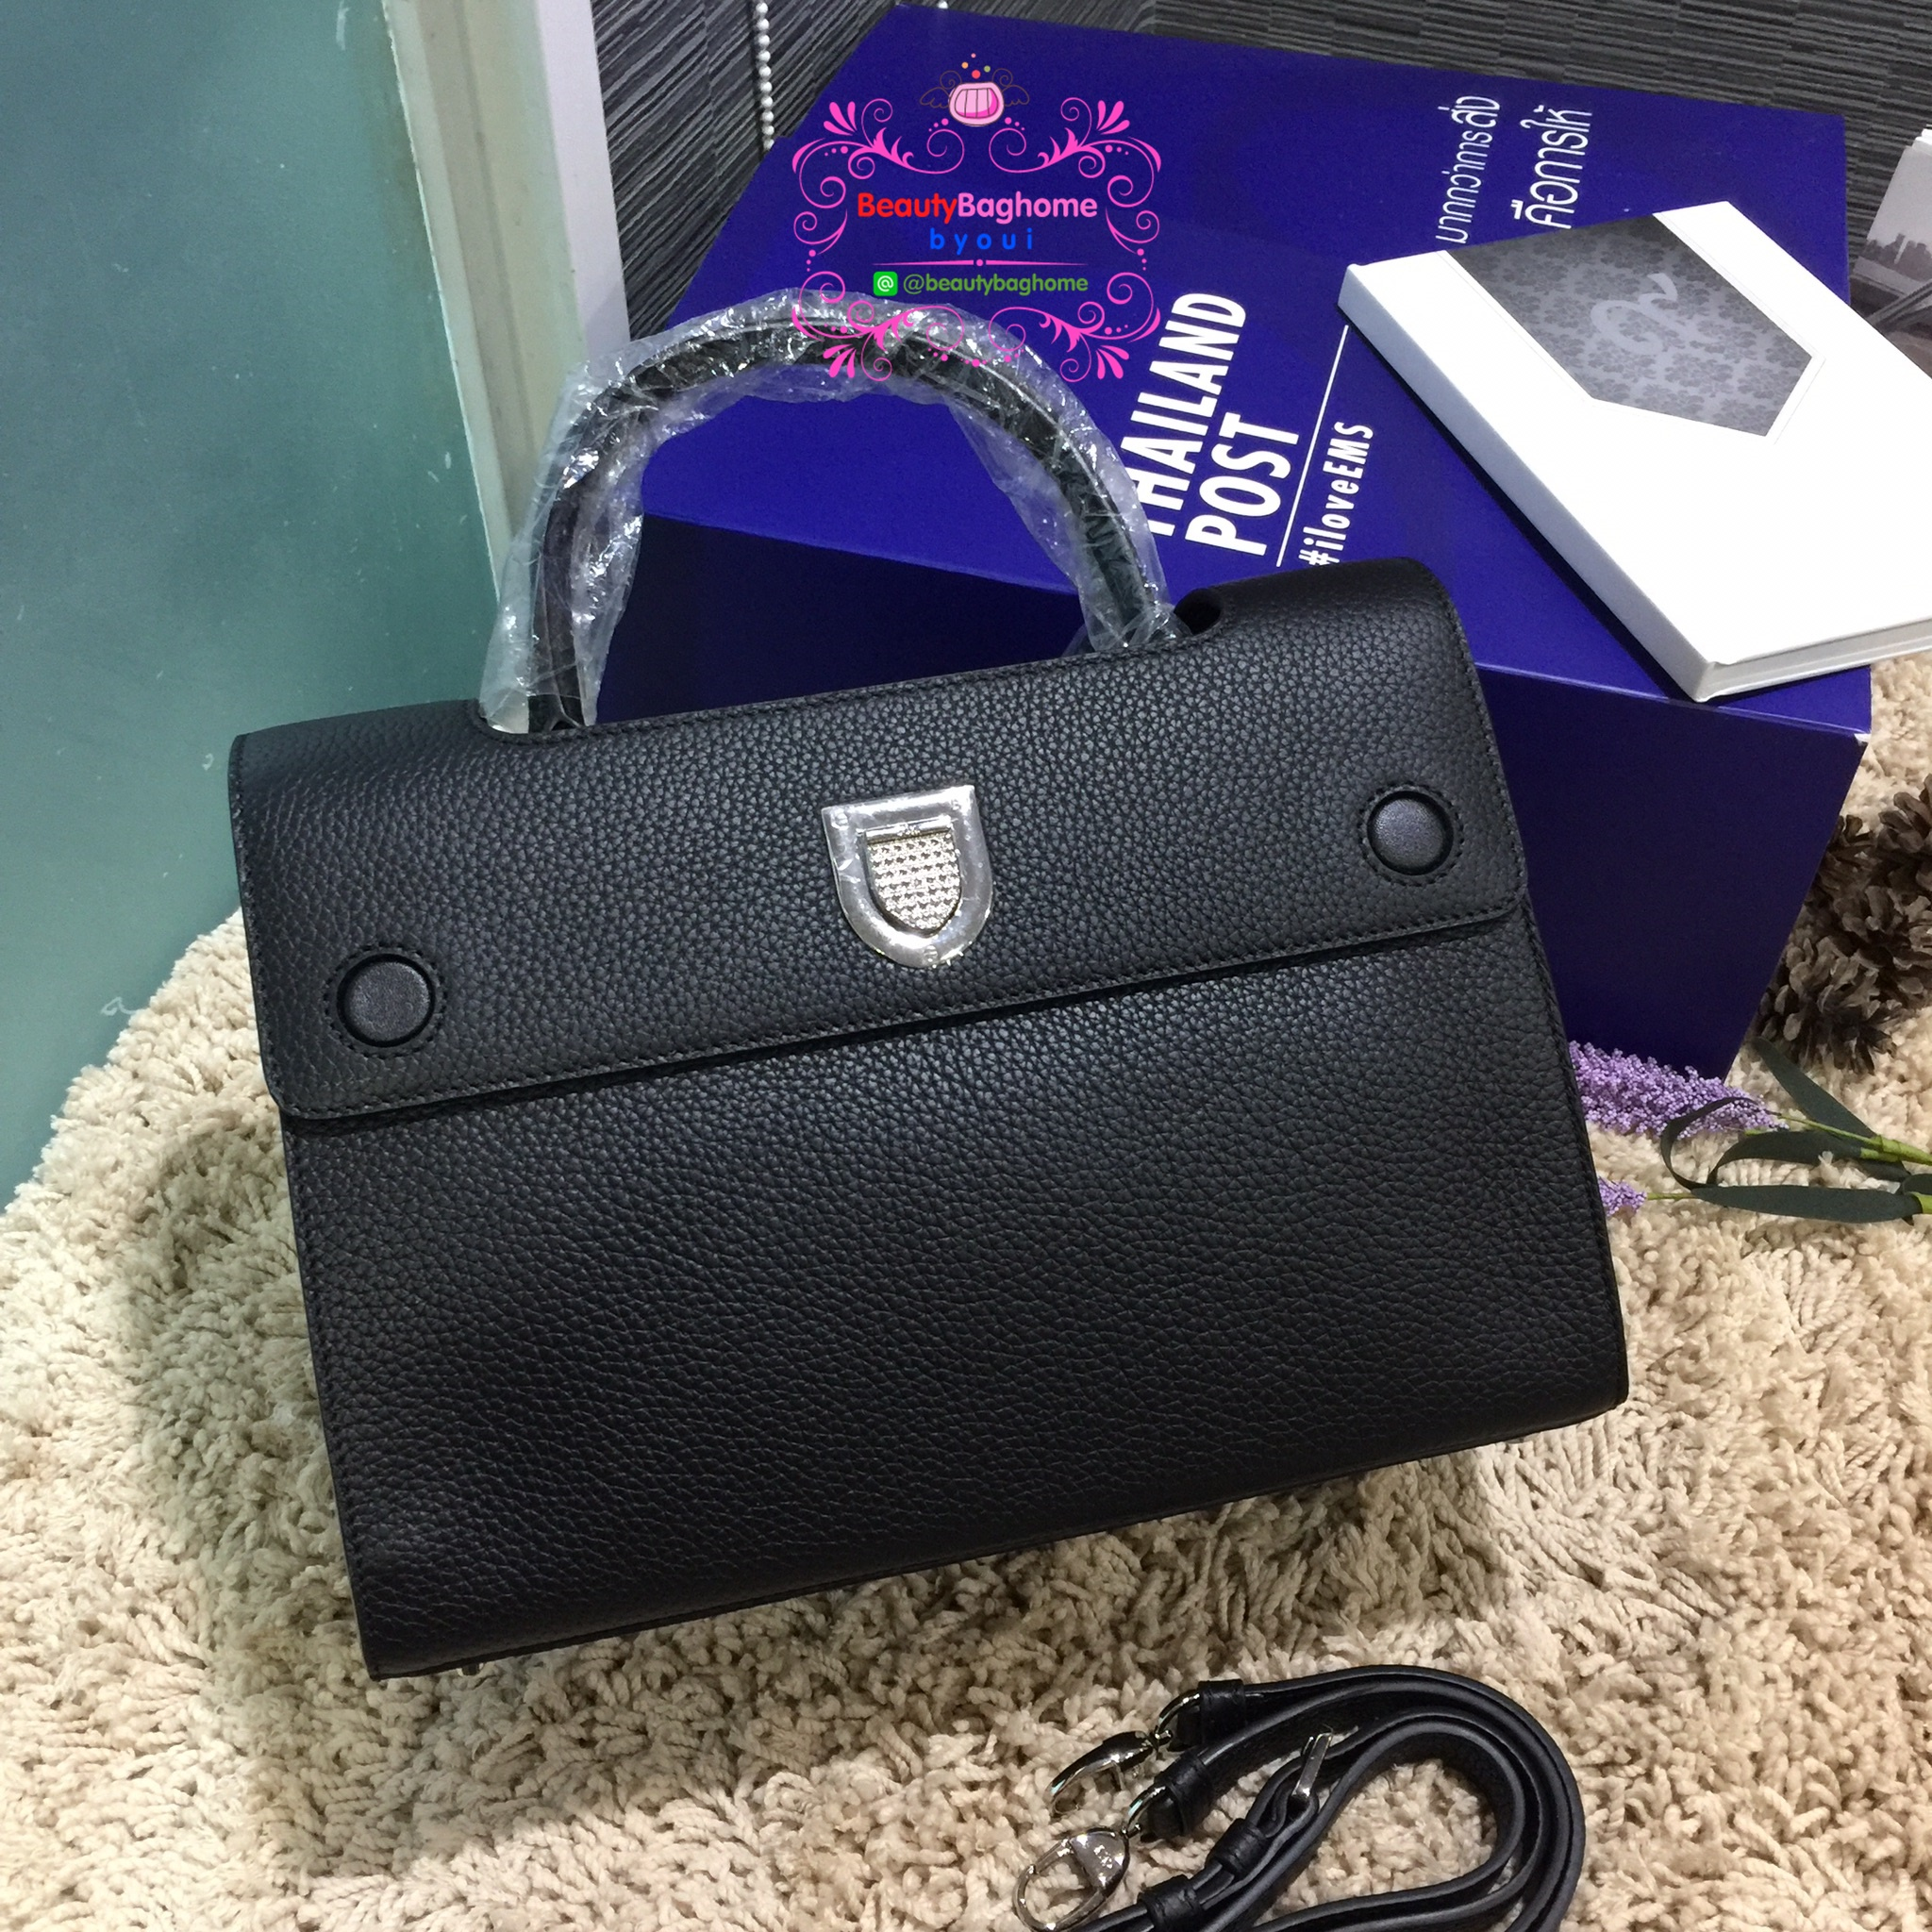 Dior Diorever bag สีดำ งานHiend Original